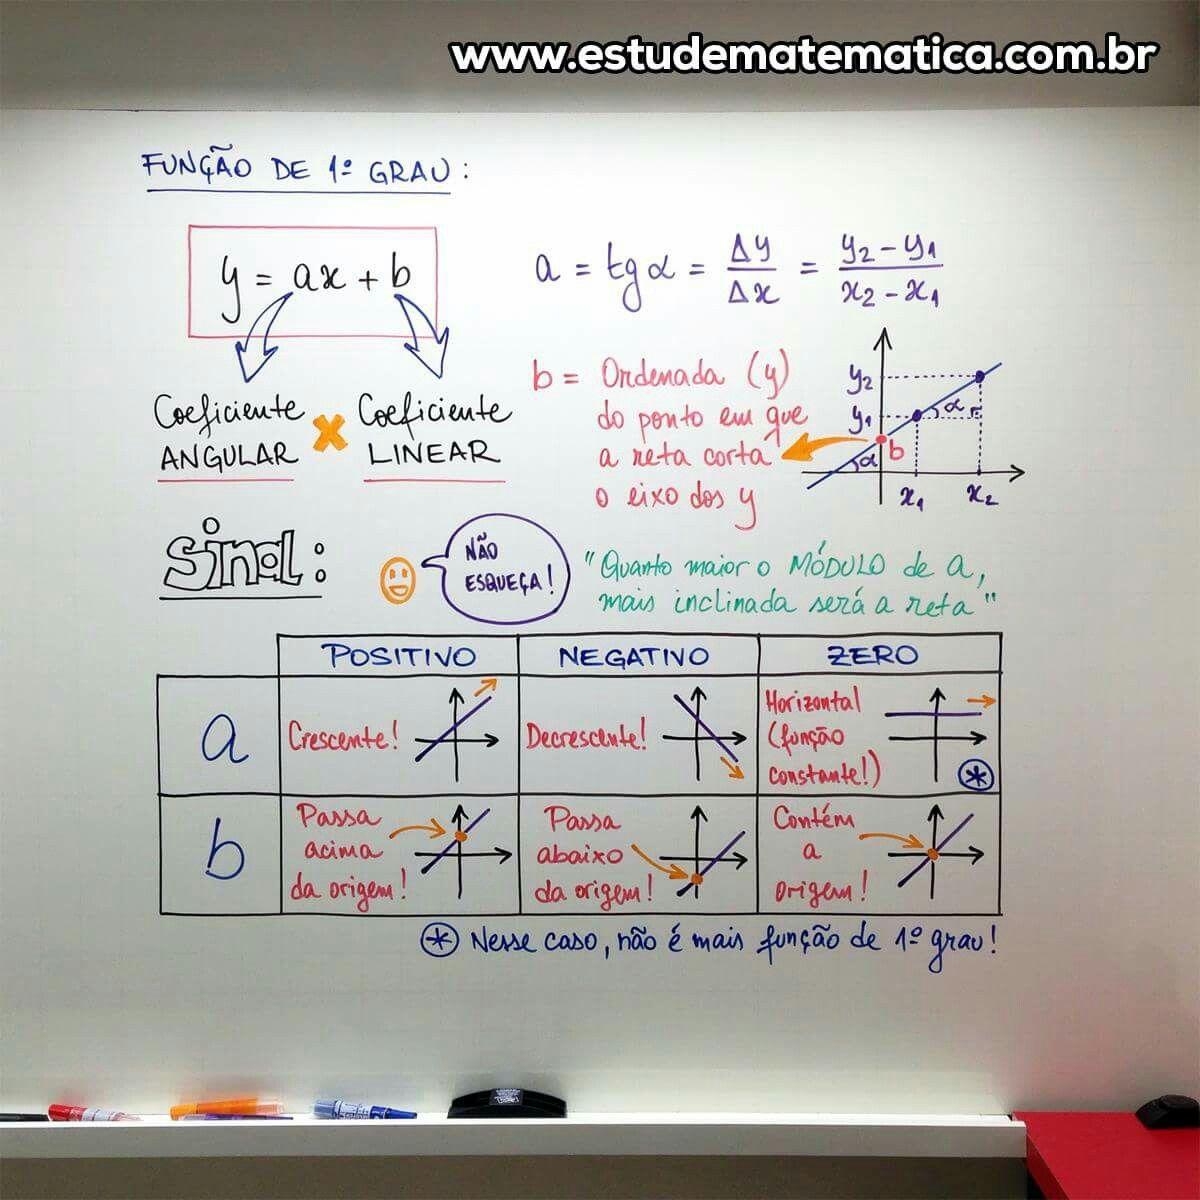 Mapa mental de funções 1 grau | Matemática | Pinterest | Math ...